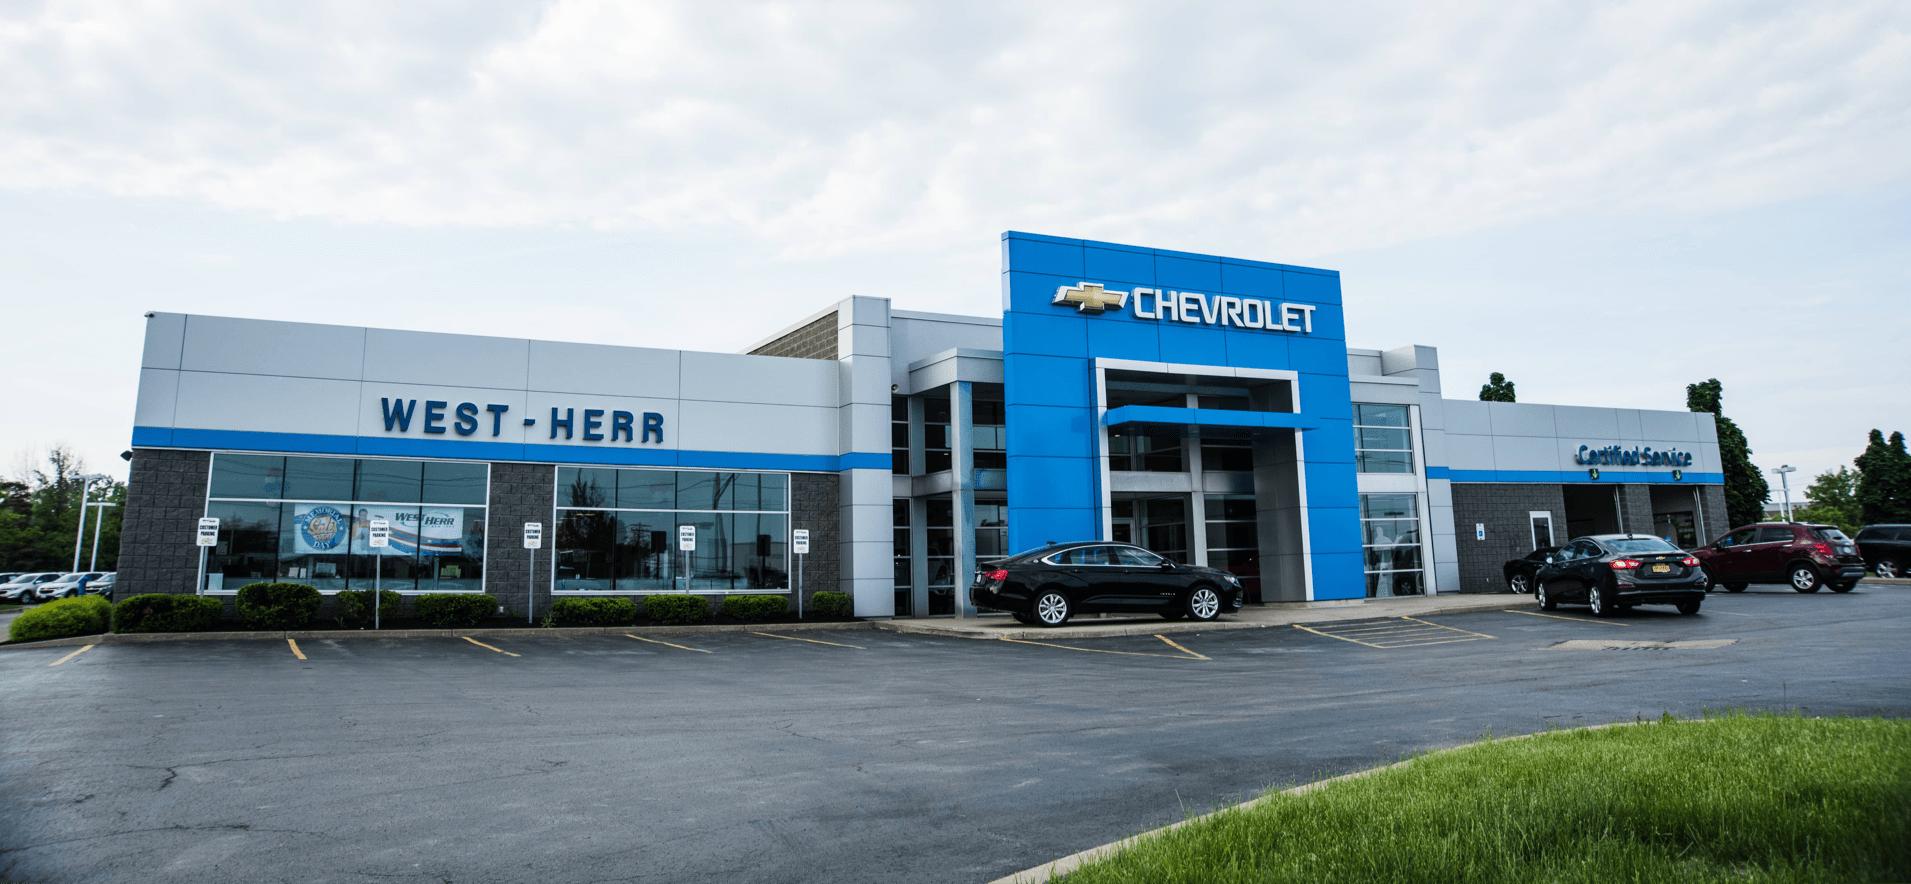 West Herr dealership outside view